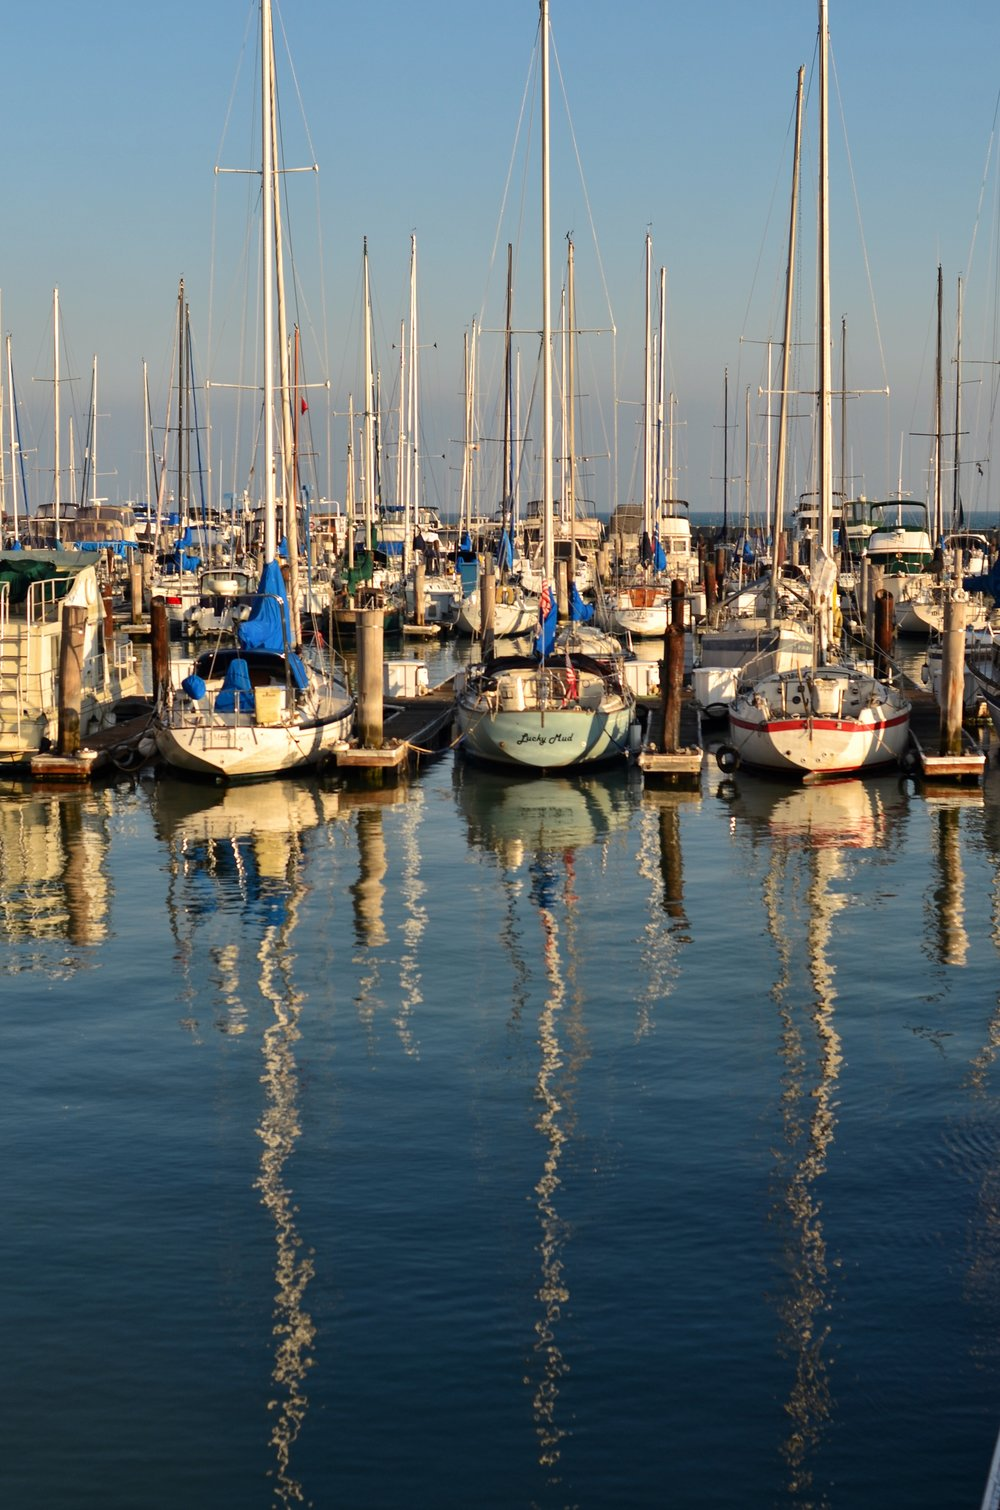 Sail Boats docked in a Marina in San Francisco Bay